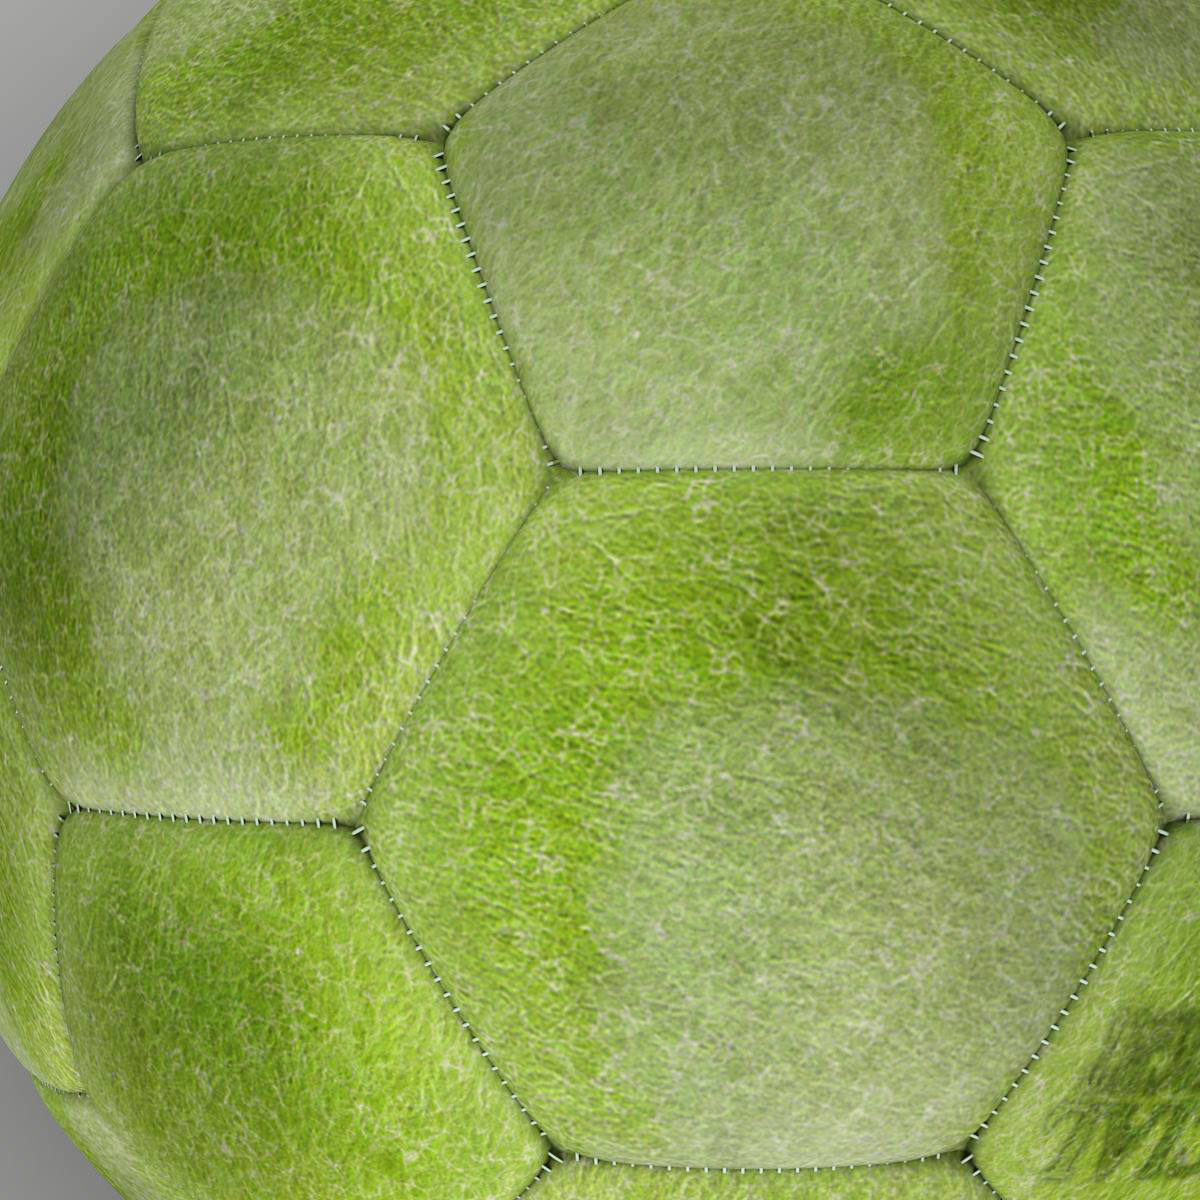 soccerball дотроо 3d загвар 3ds max fbx c4d м mb obj 205140